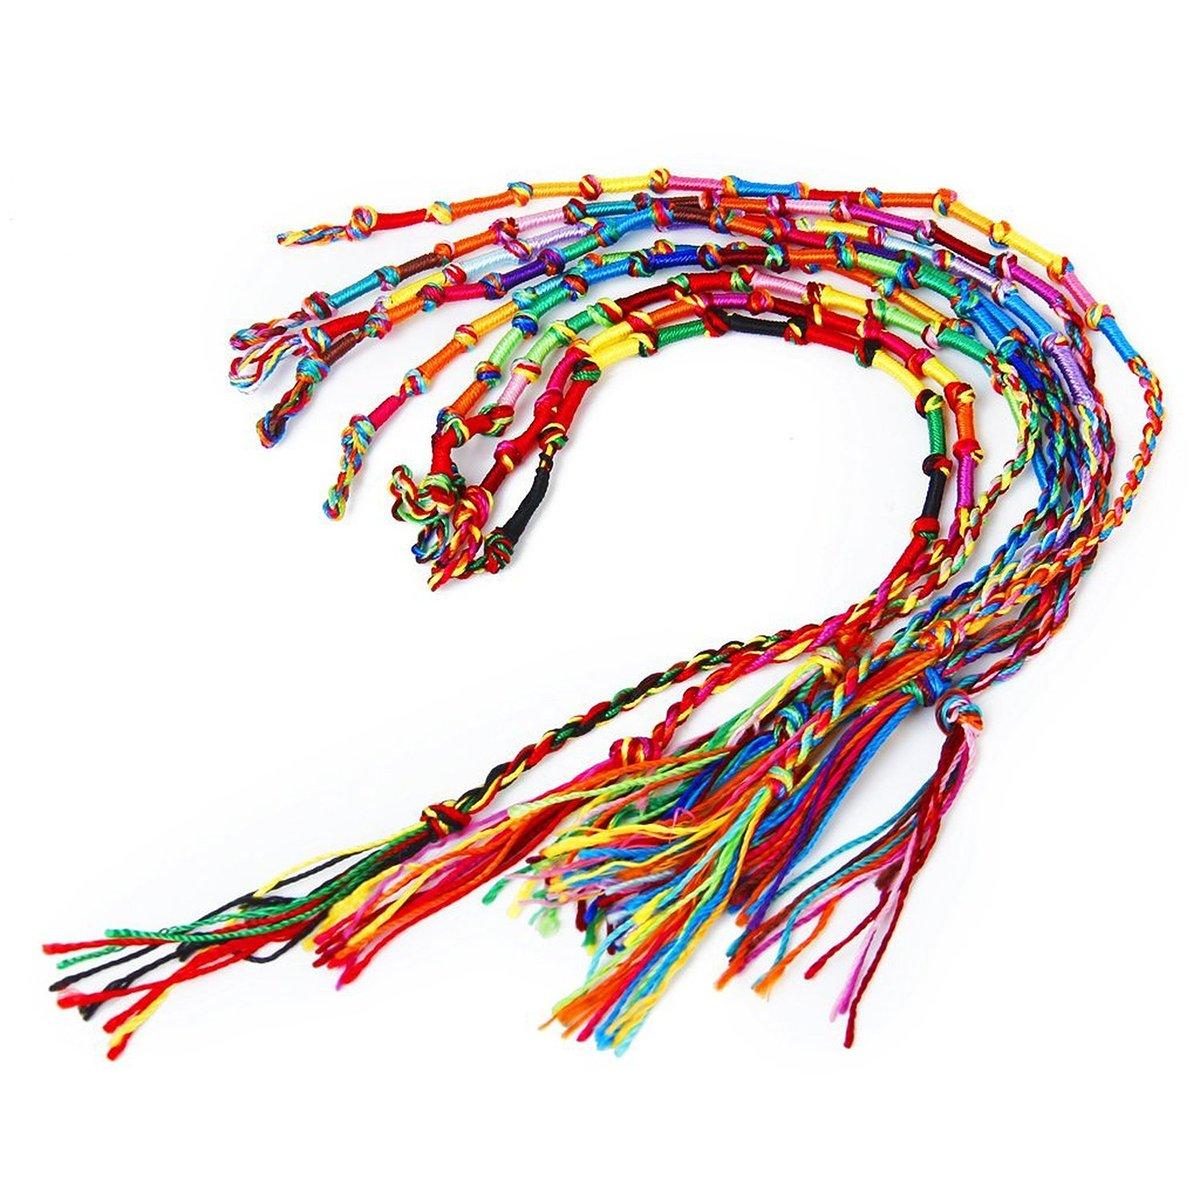 NUOLUX 9pcs Friendship Bracelets Thread Wrist Ankle Bracelets Hippie Style Random Color zHg3FIJUl